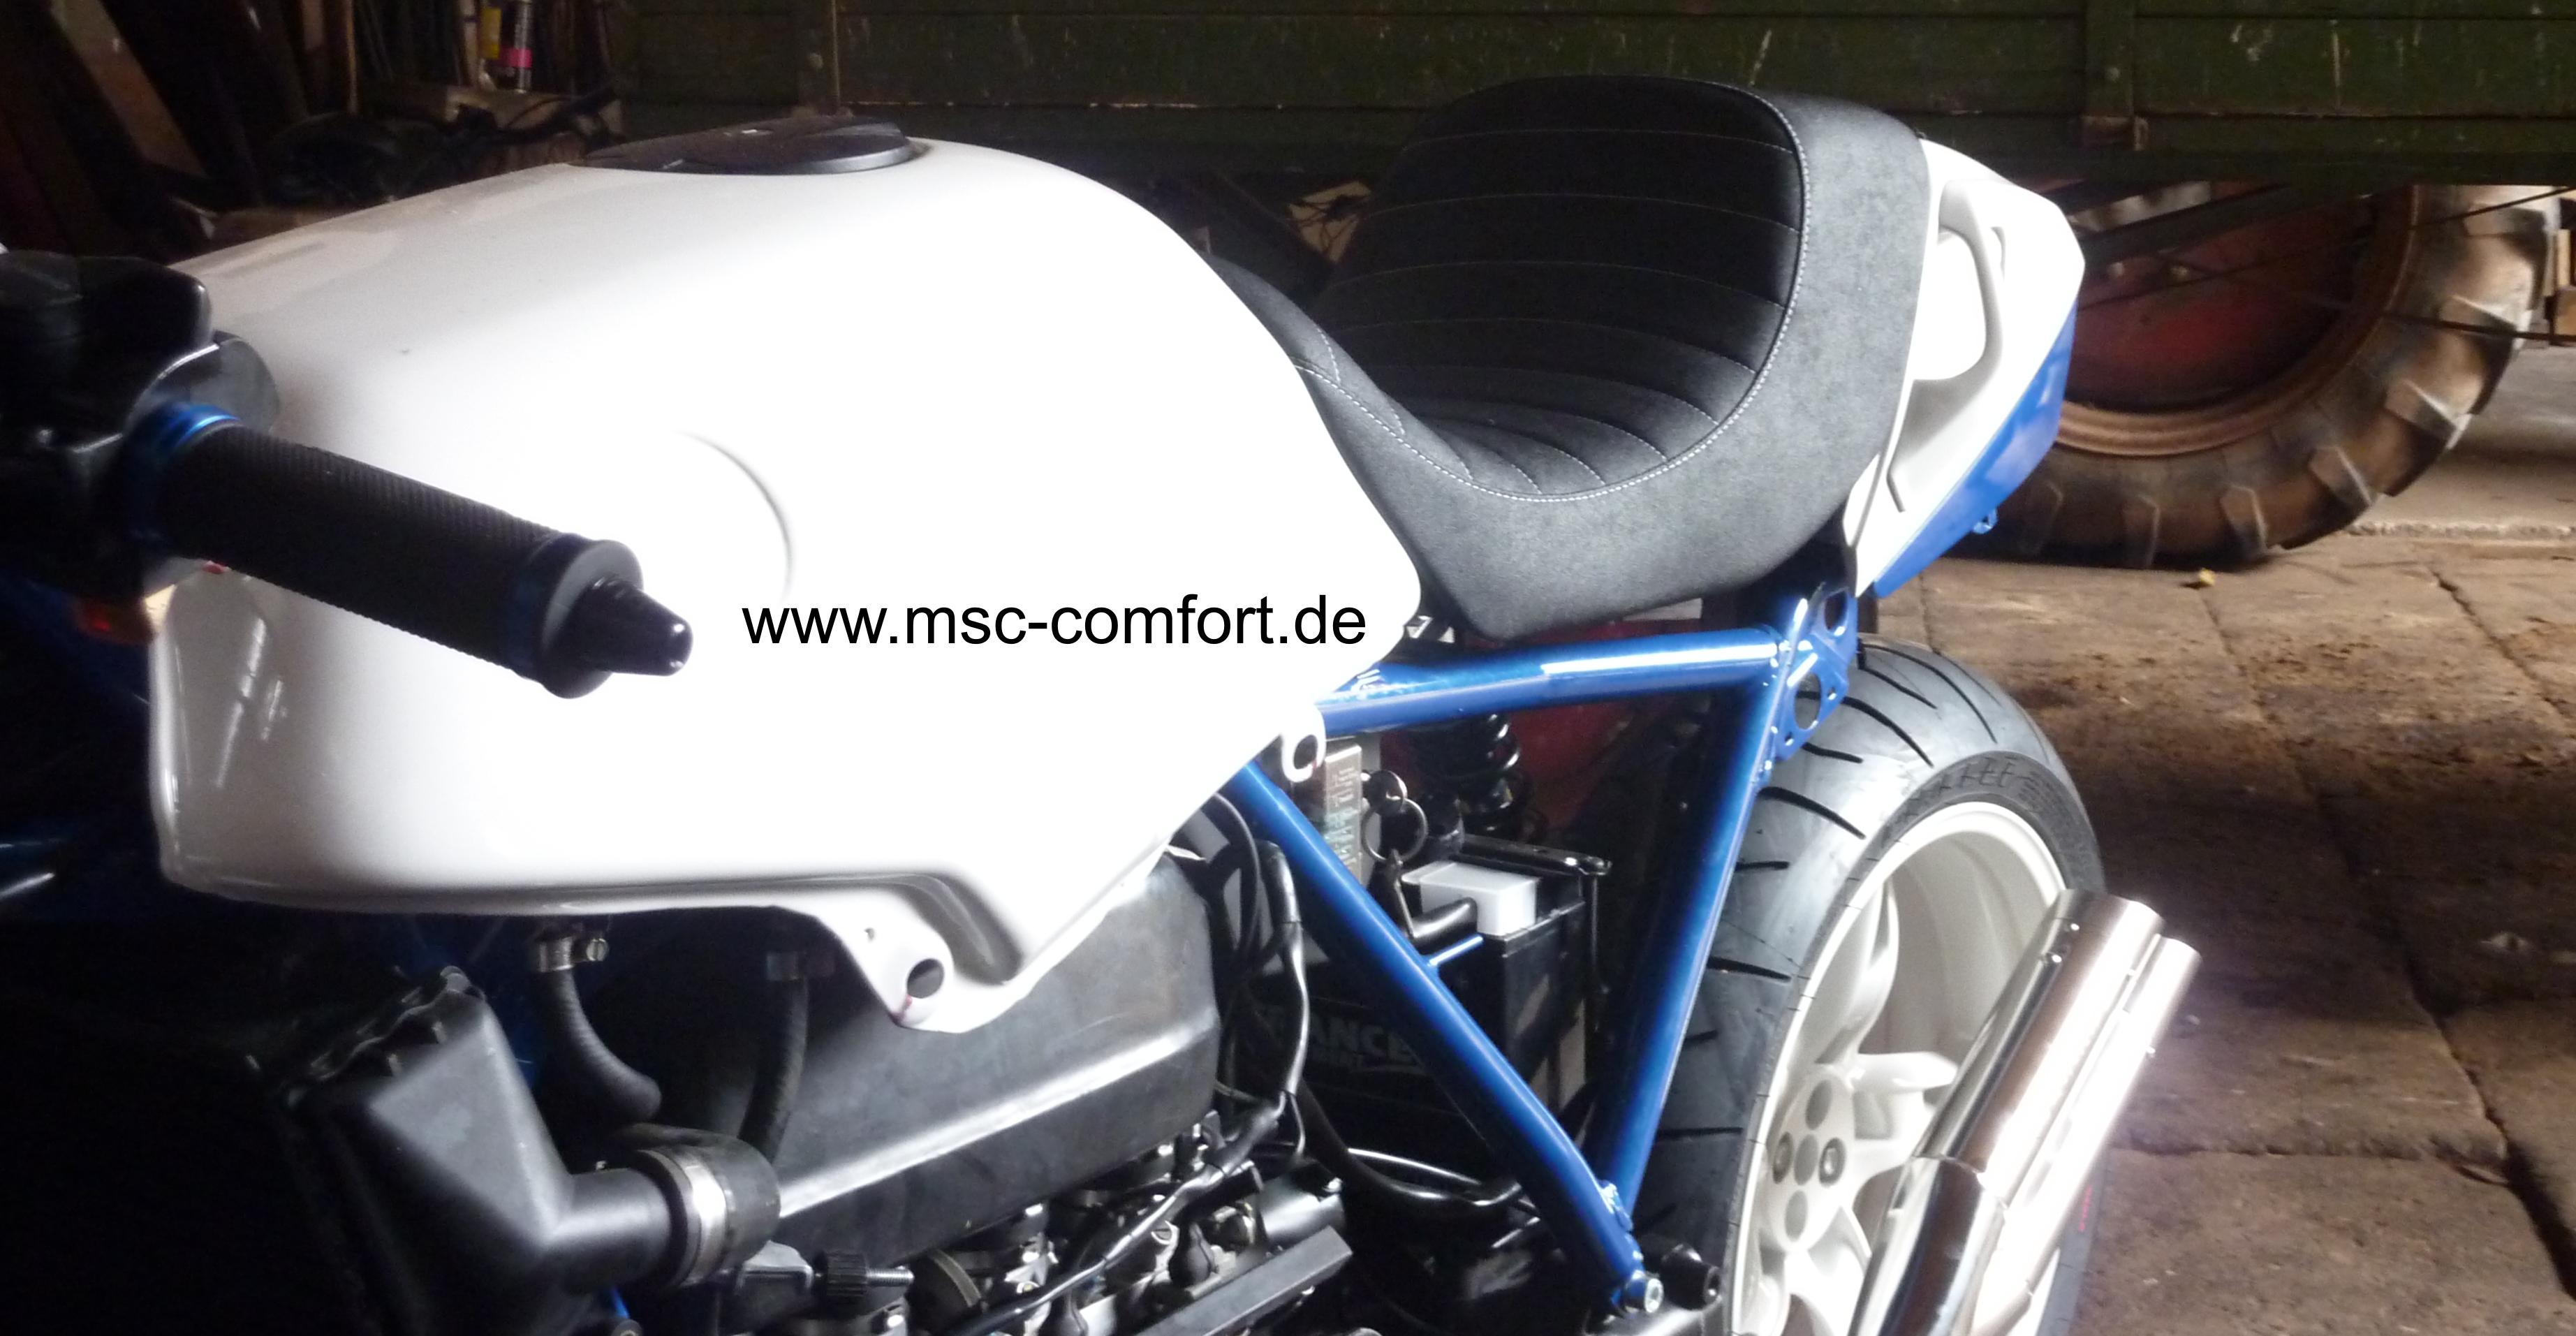 BMW-Scrambler Sitzbank Eigenbau